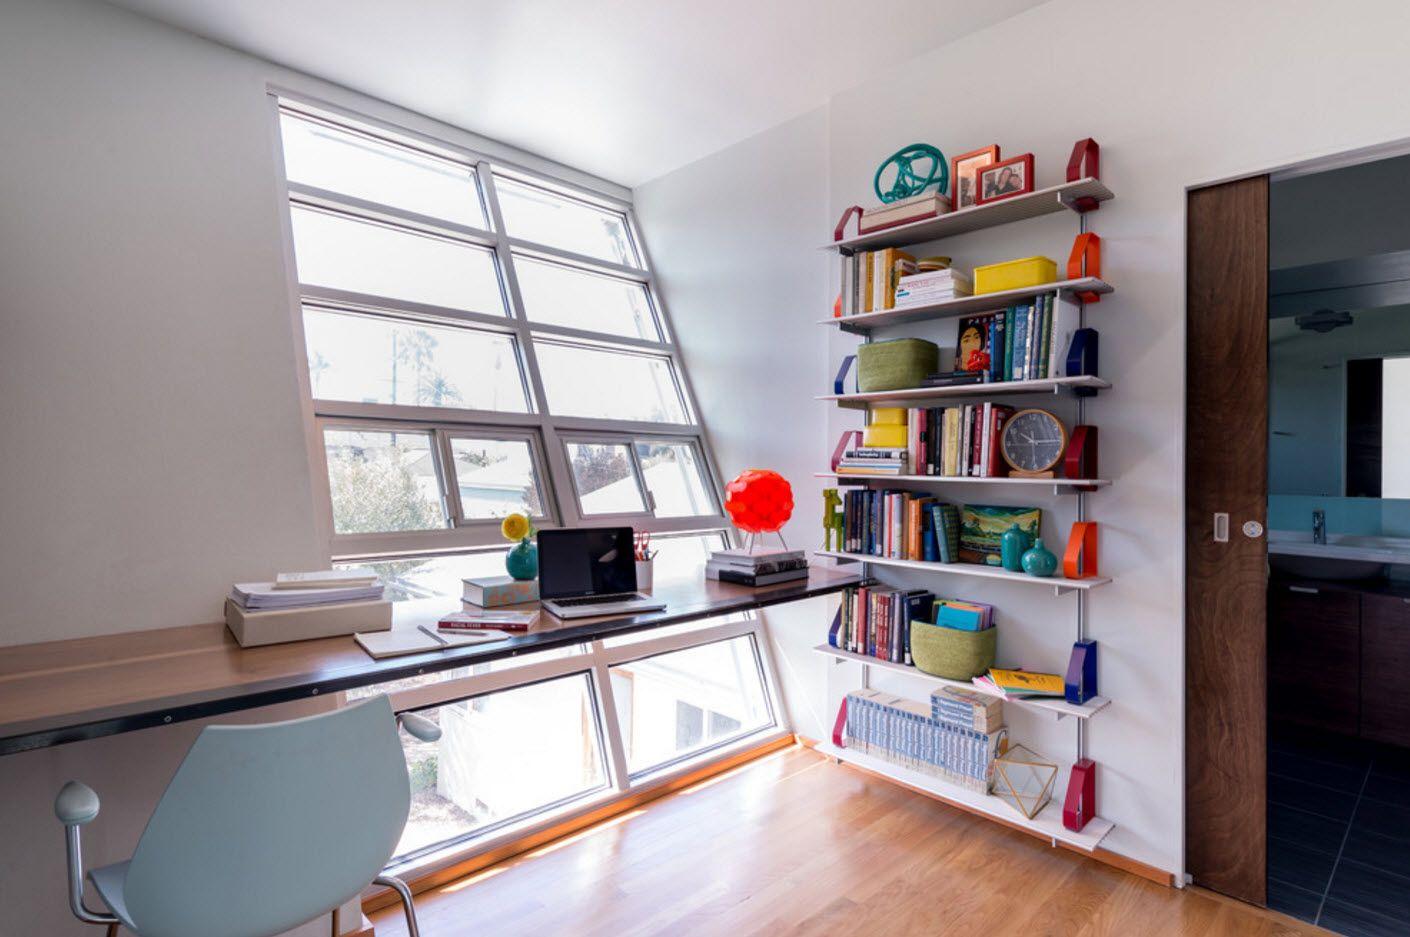 Unusal slanted window pane at the modern home office 2017